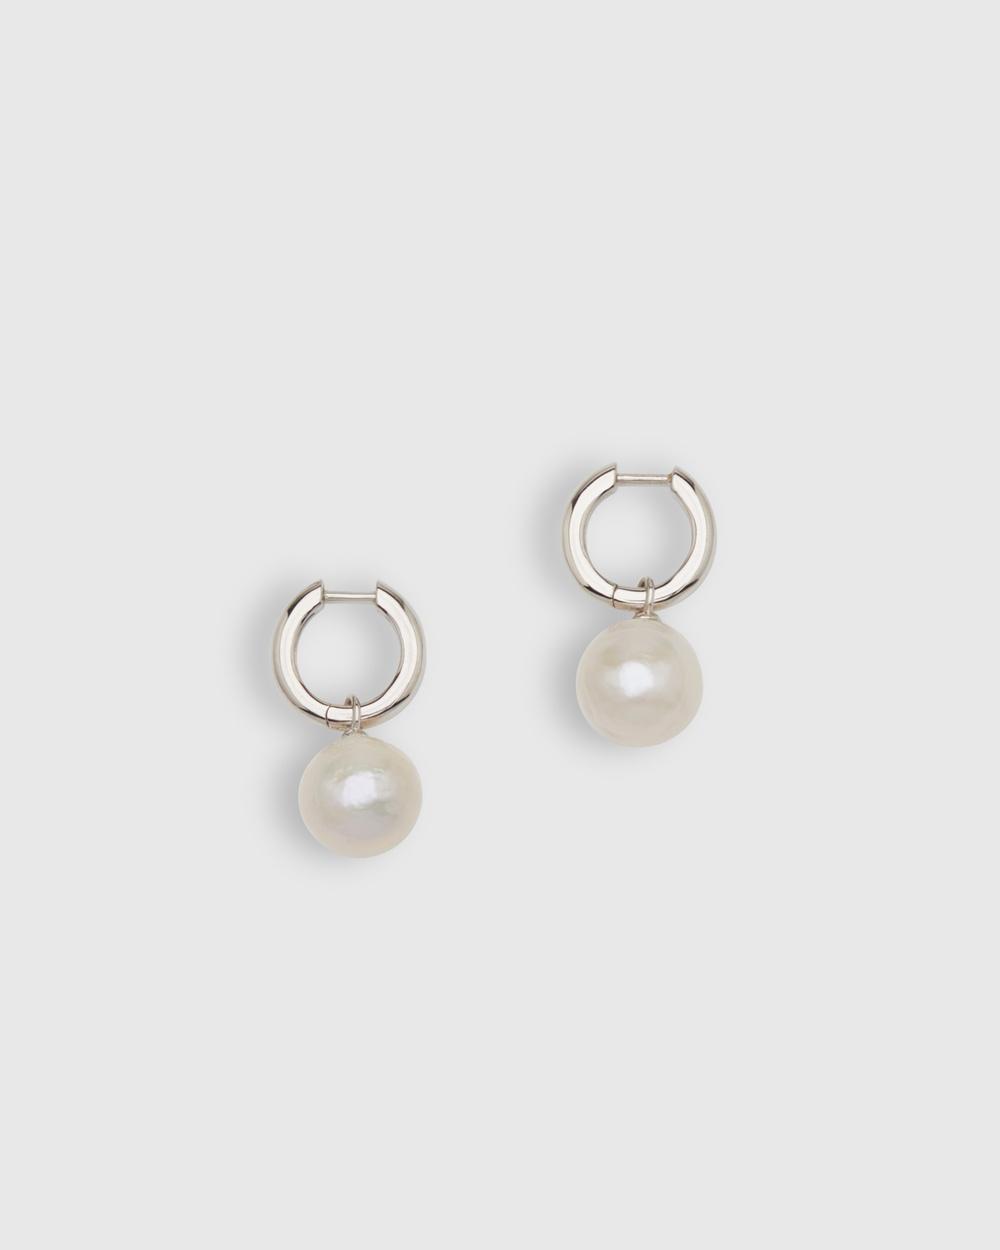 ALIX YANG Lucie Earrings Jewellery Silver